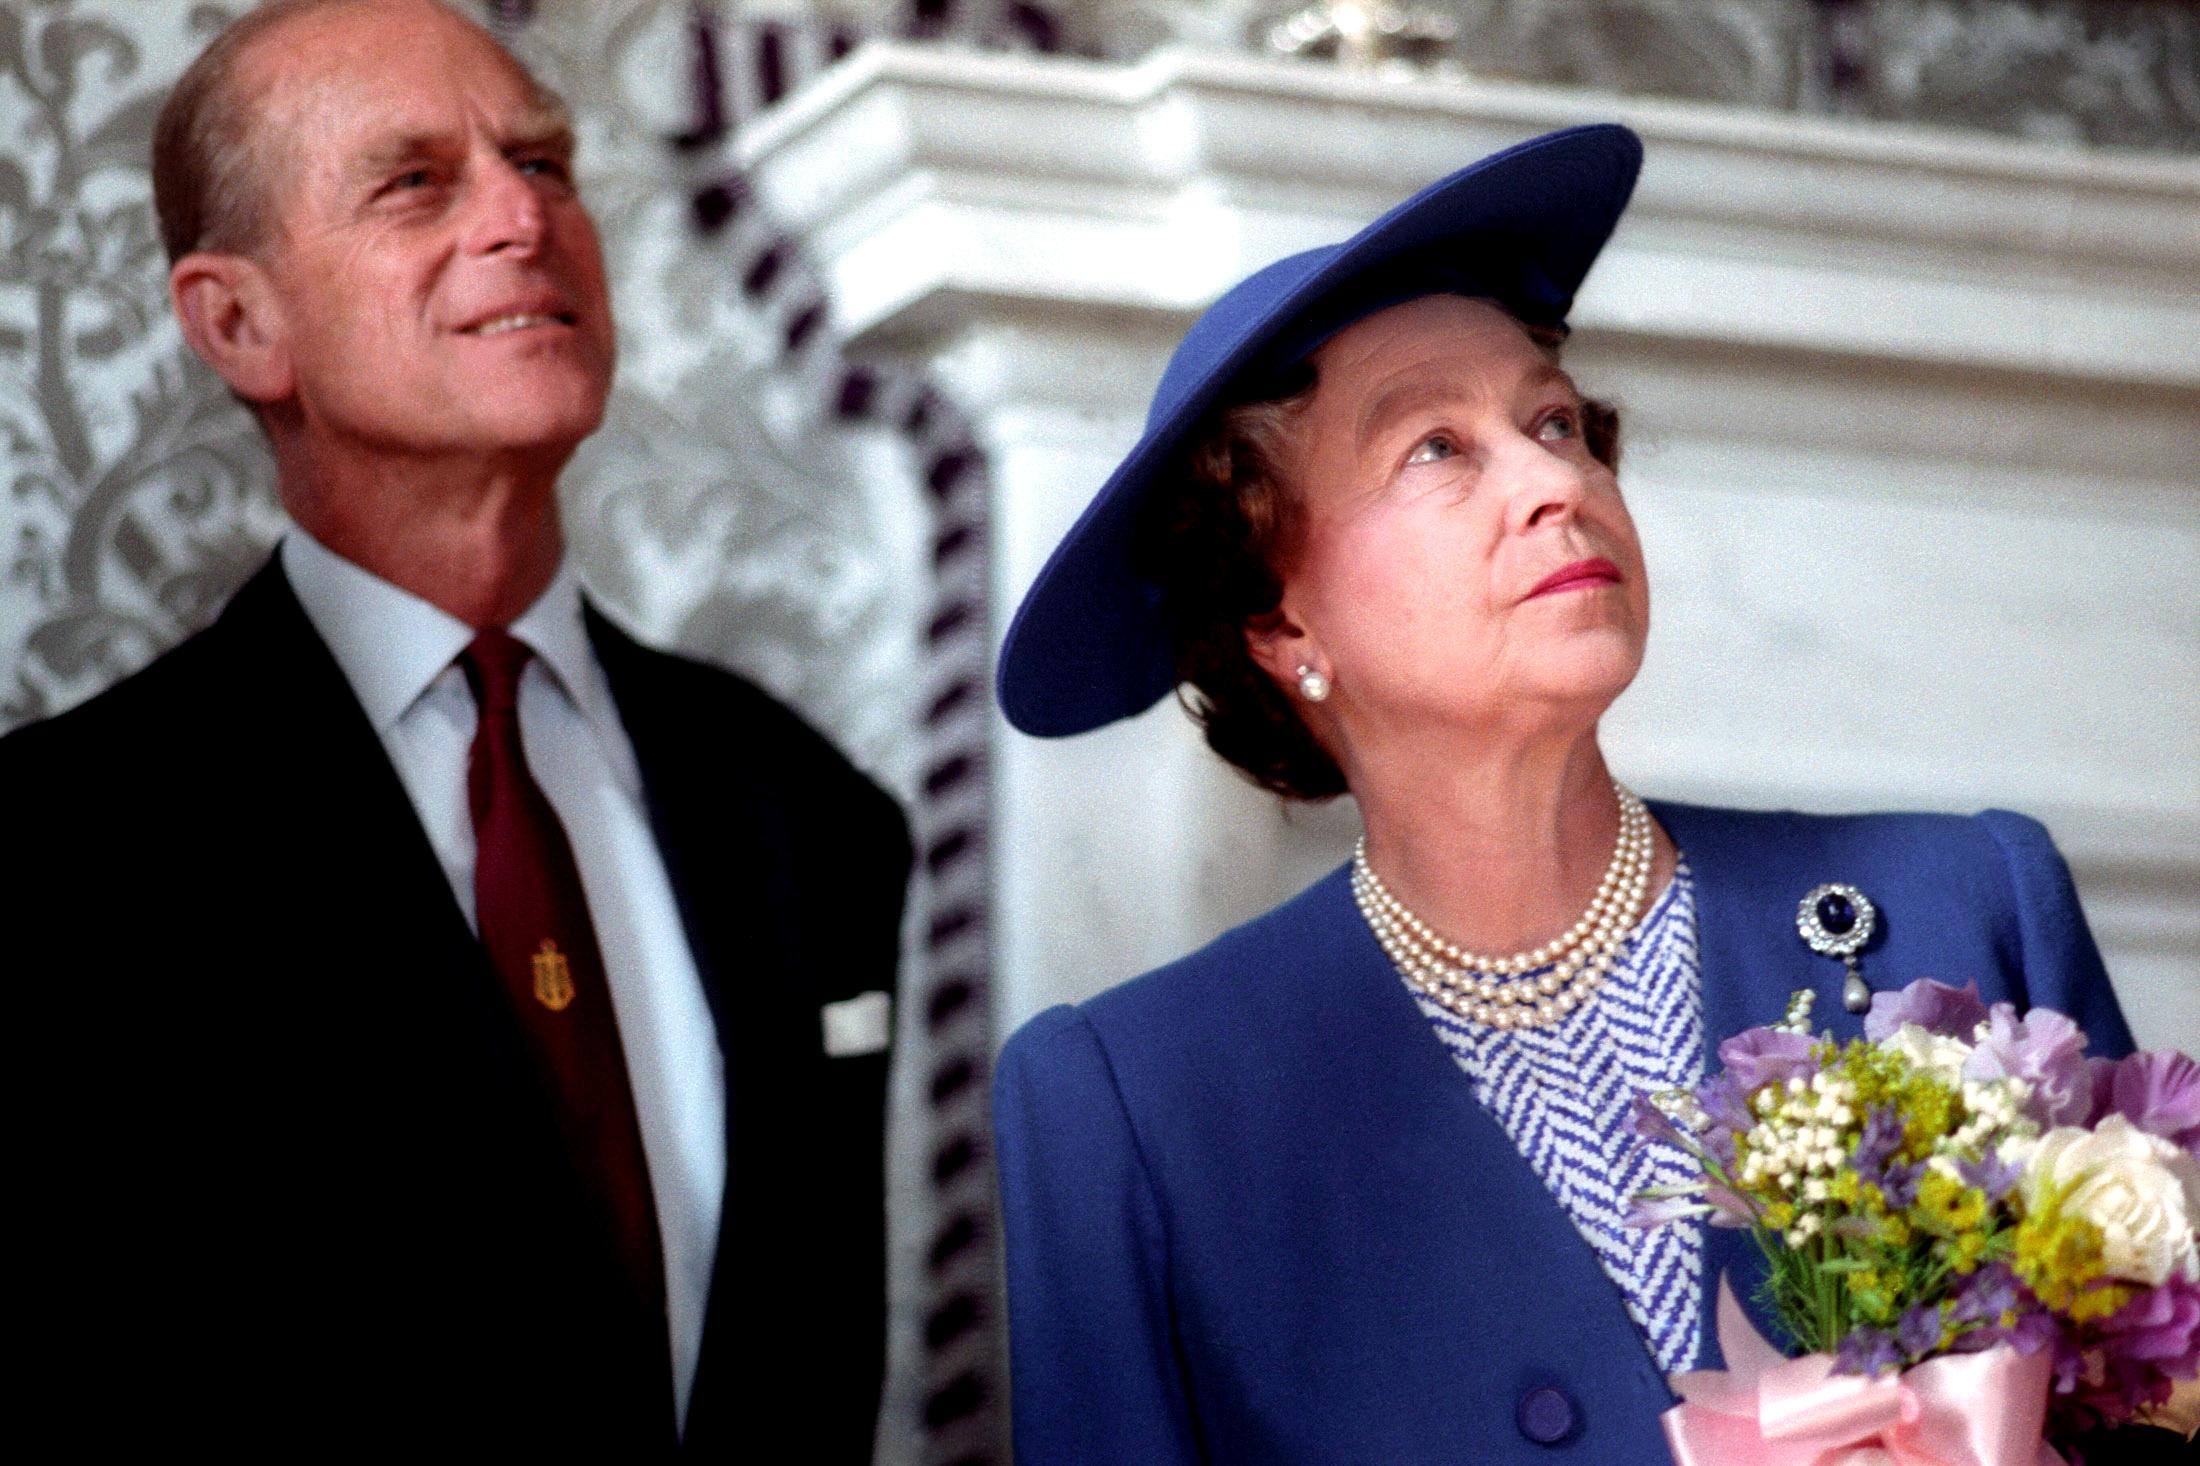 Muere príncipe Felipe, esposo de reina Isabel II